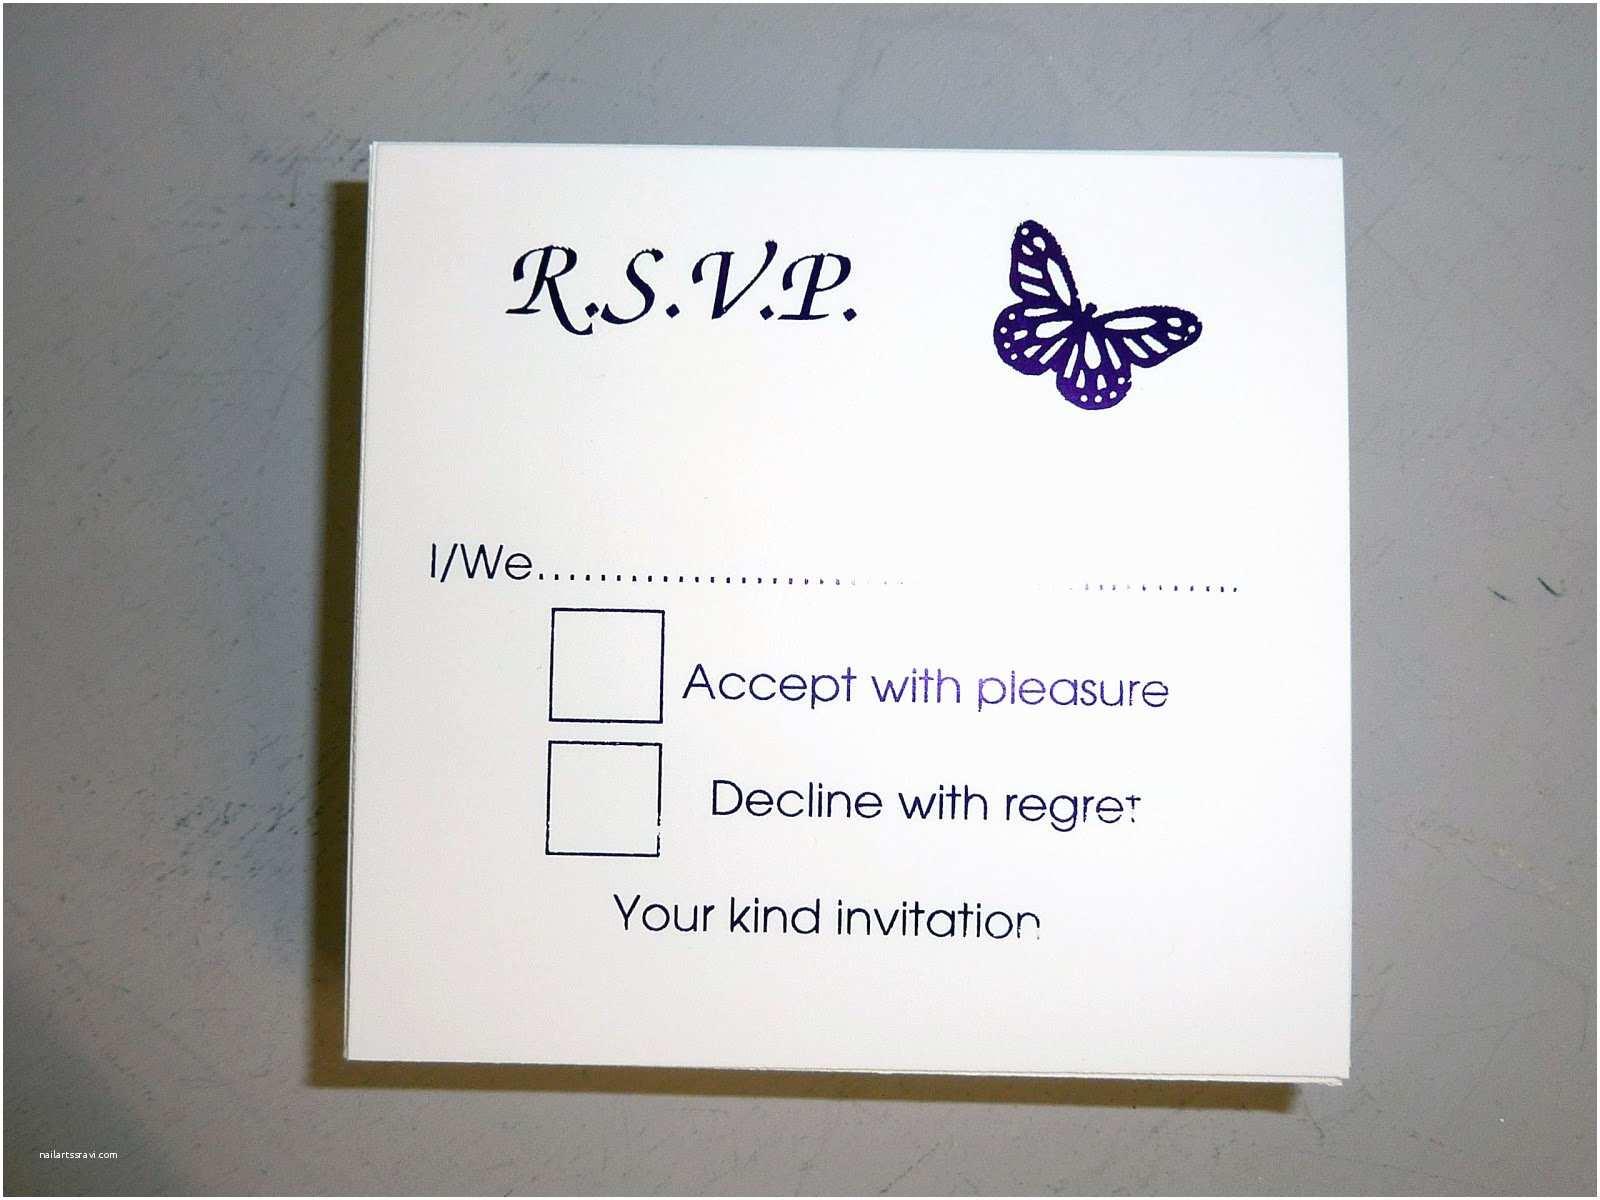 Reply to Wedding Invitation Wedding Invitations Reply Cards Wedding Invitations